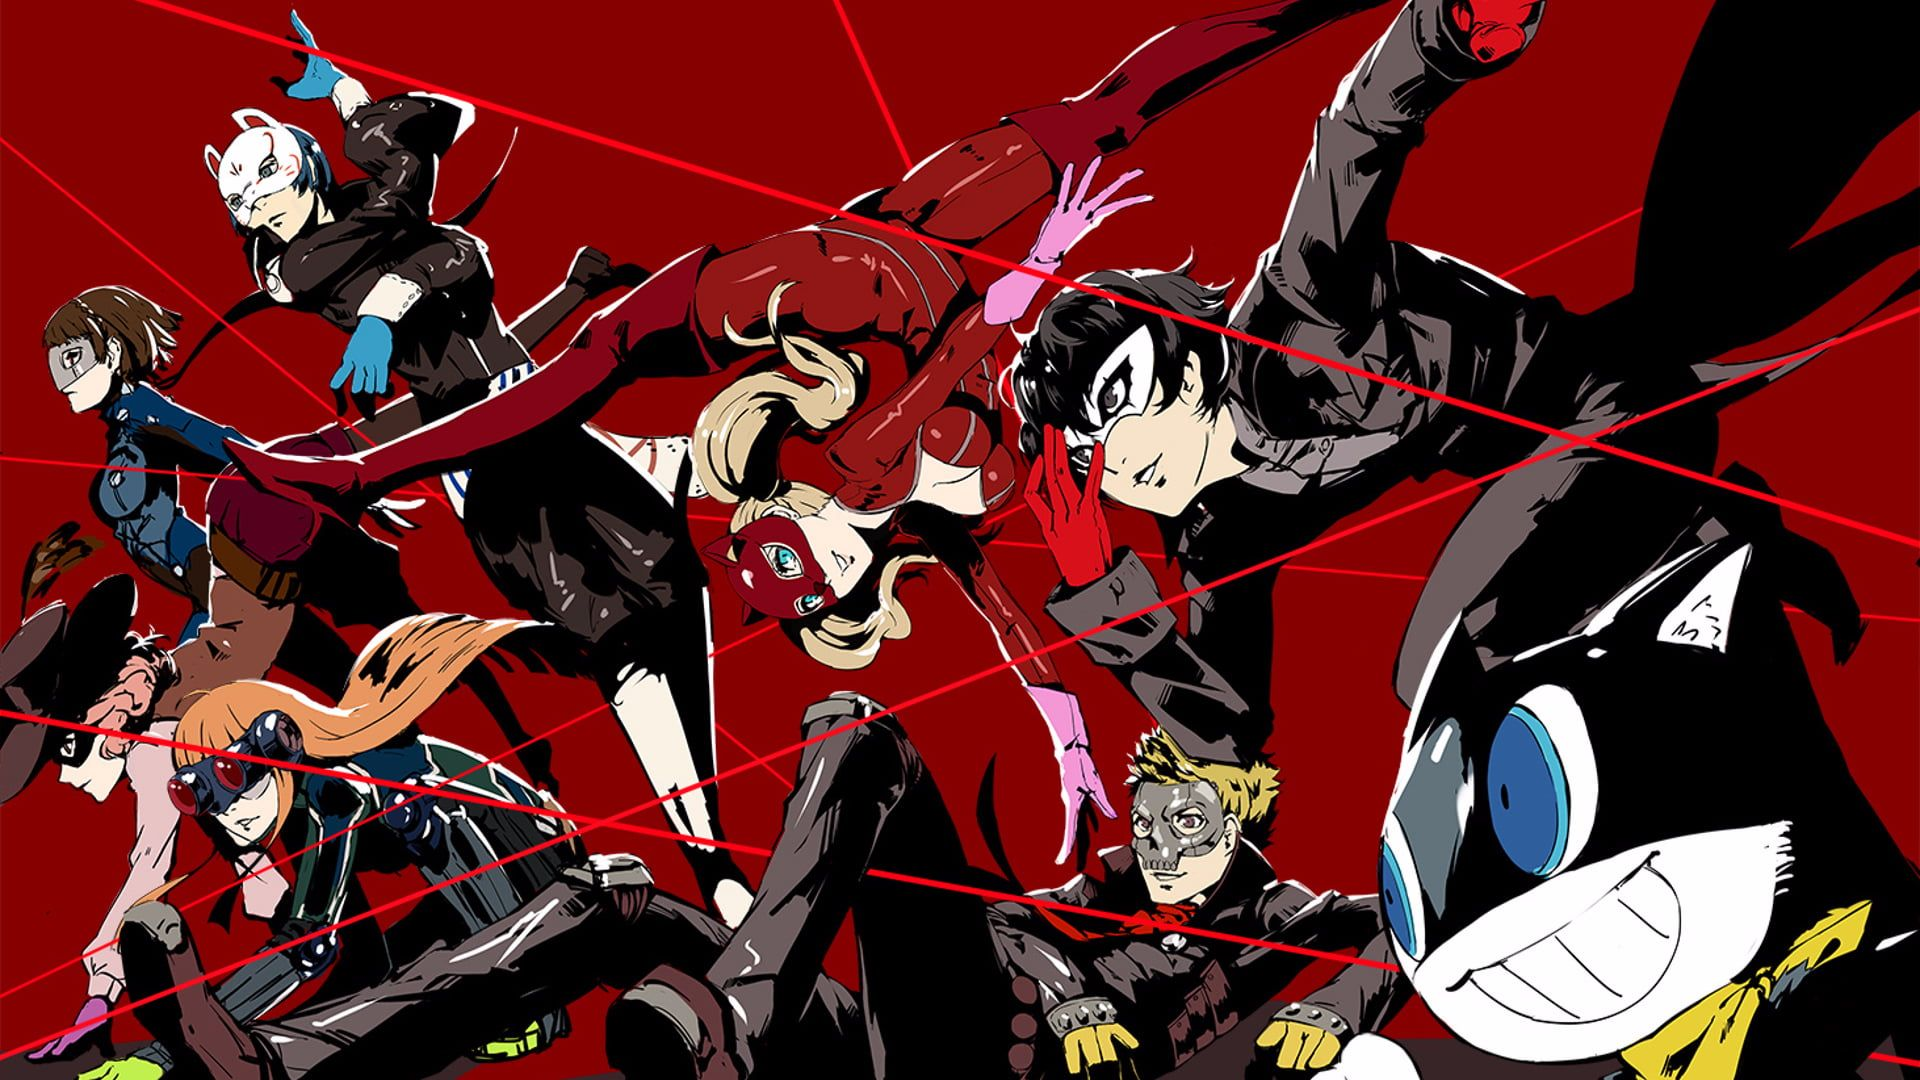 Anime Characters Digital Wallpaper Persona 5 Persona Series Phantom Thieves 1080p Wallpaper Hdwallpaper Desktop Persona 5 Persona 5 Joker Persona